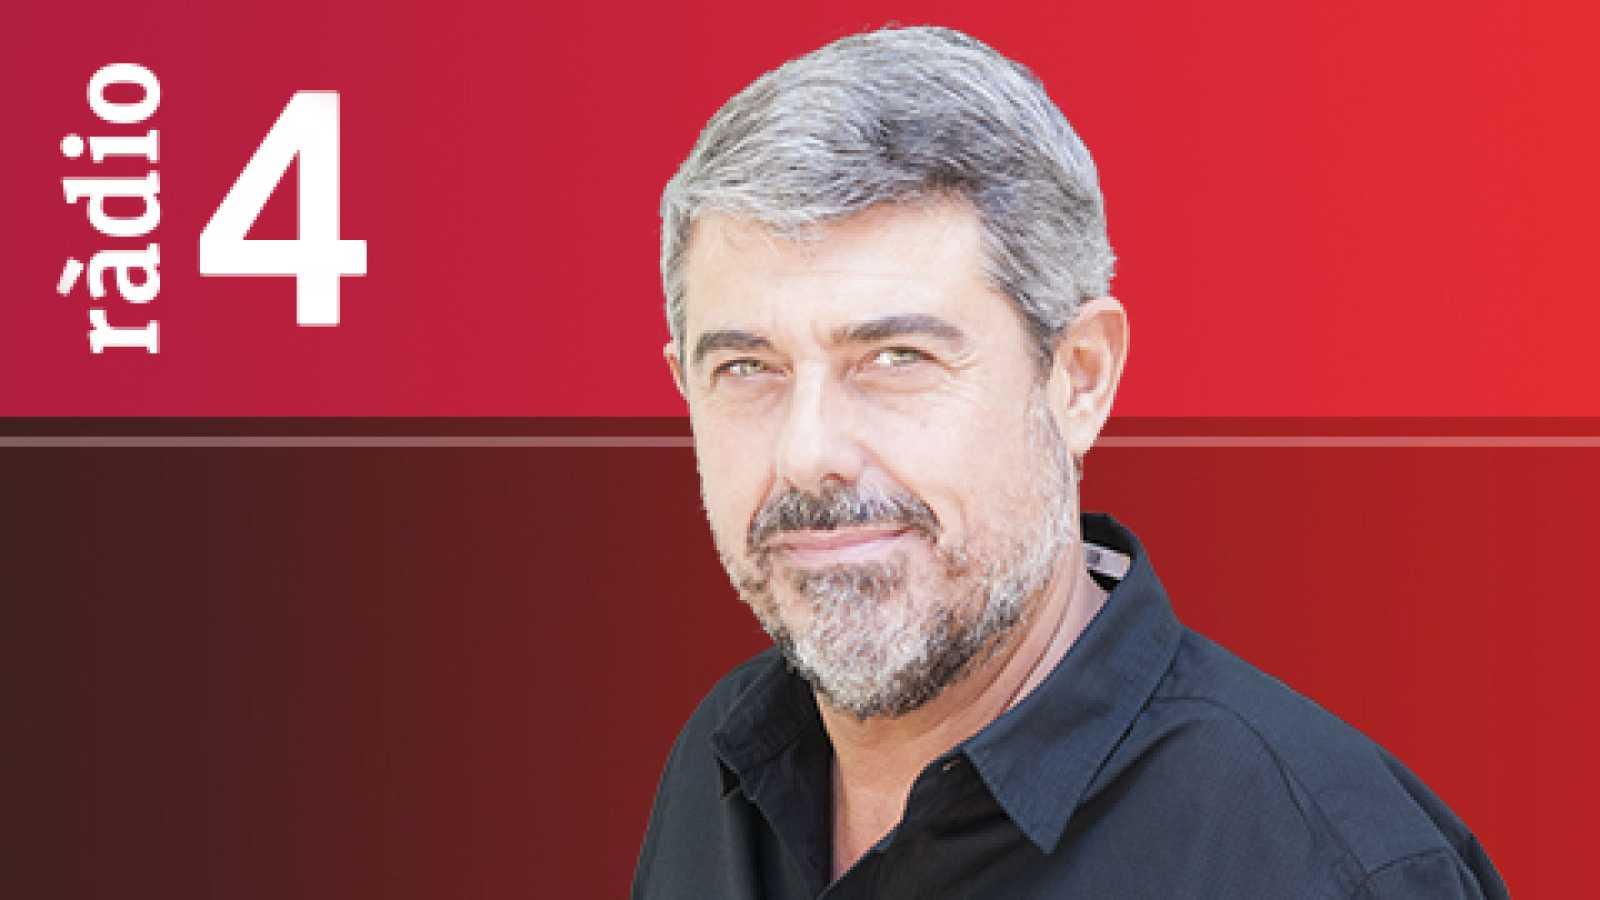 Anem de tarda - A Boca de Canó: Don Santiago Torres